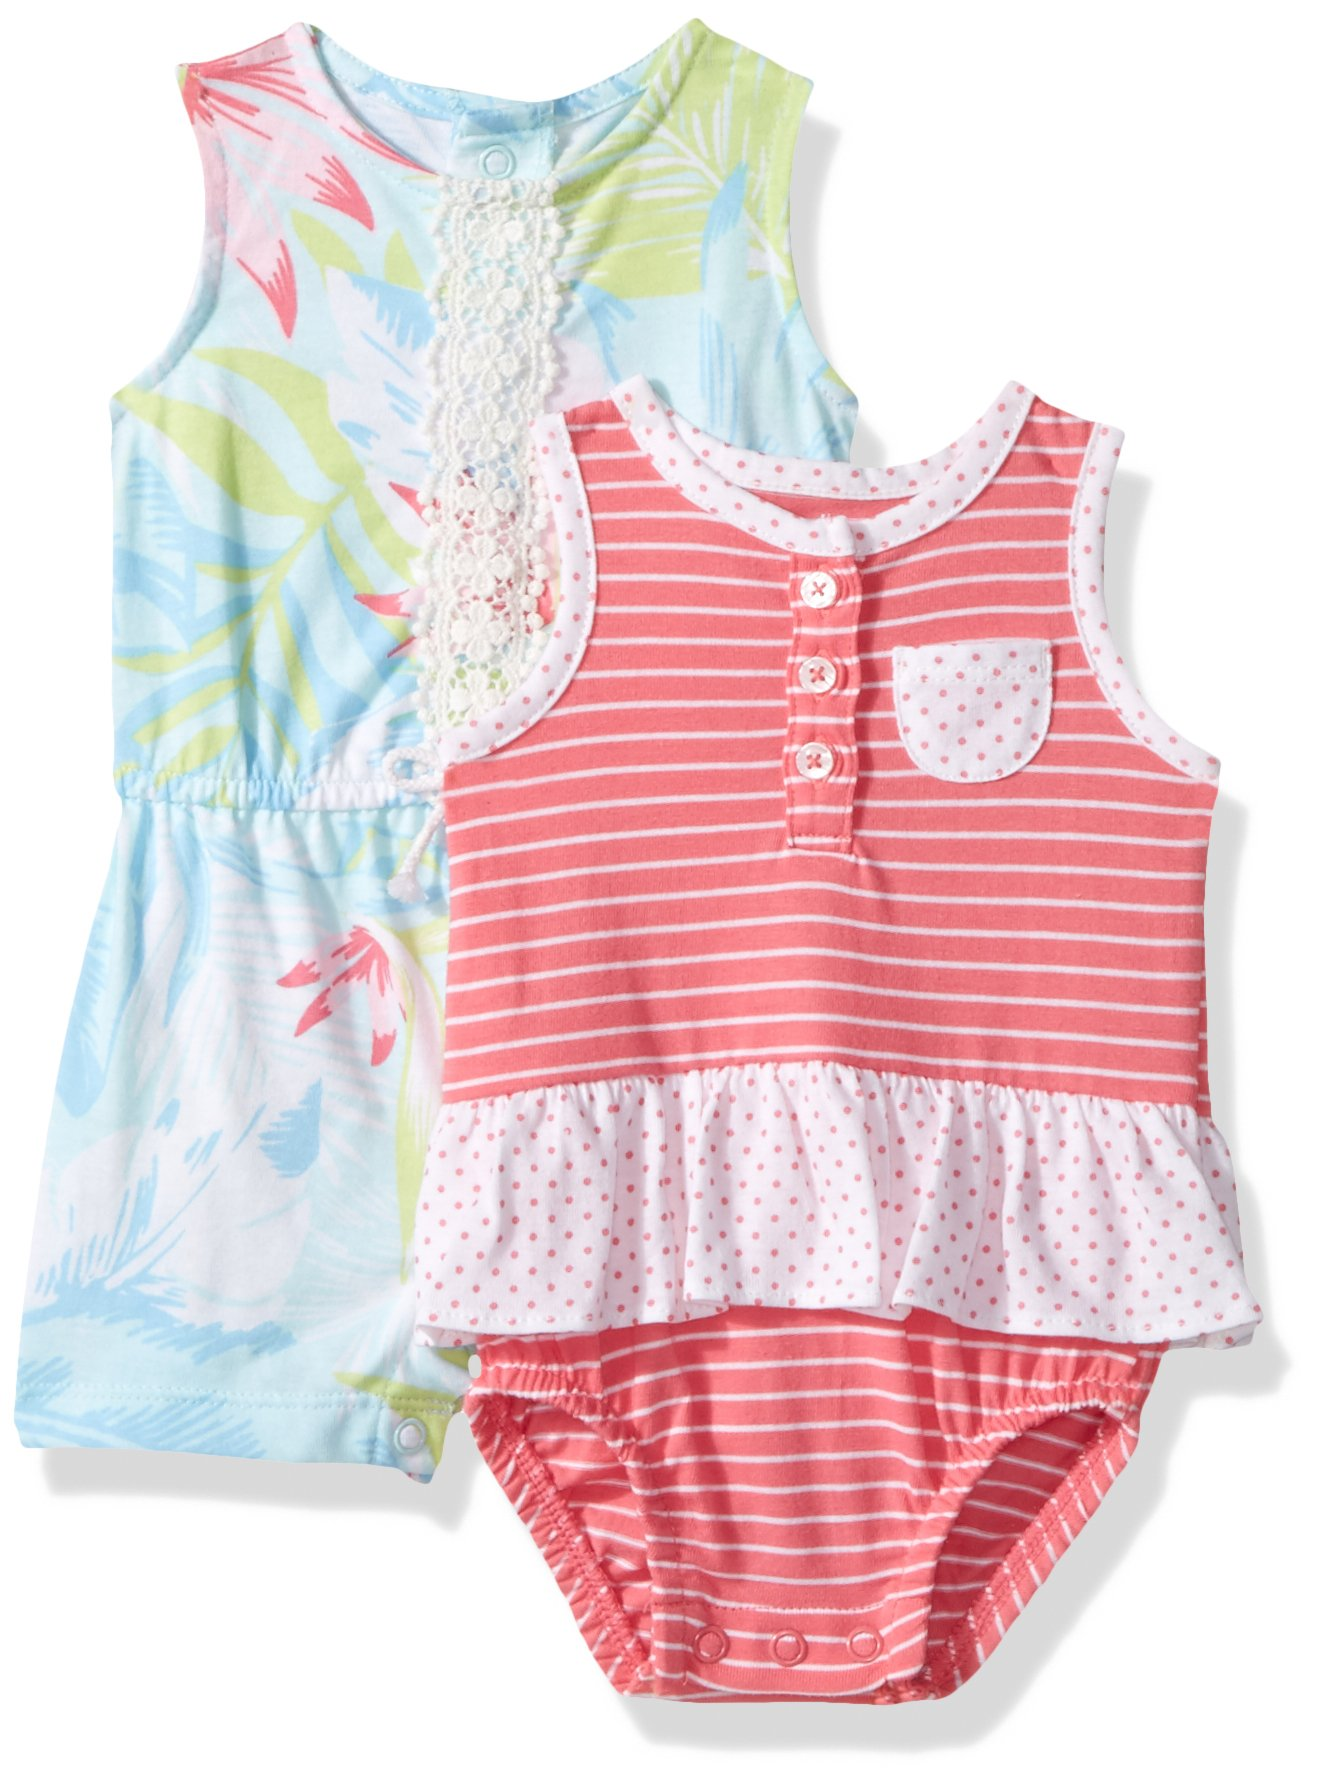 Carter's Baby Girls' 2-Pack Romper, Floral/Pink, 18